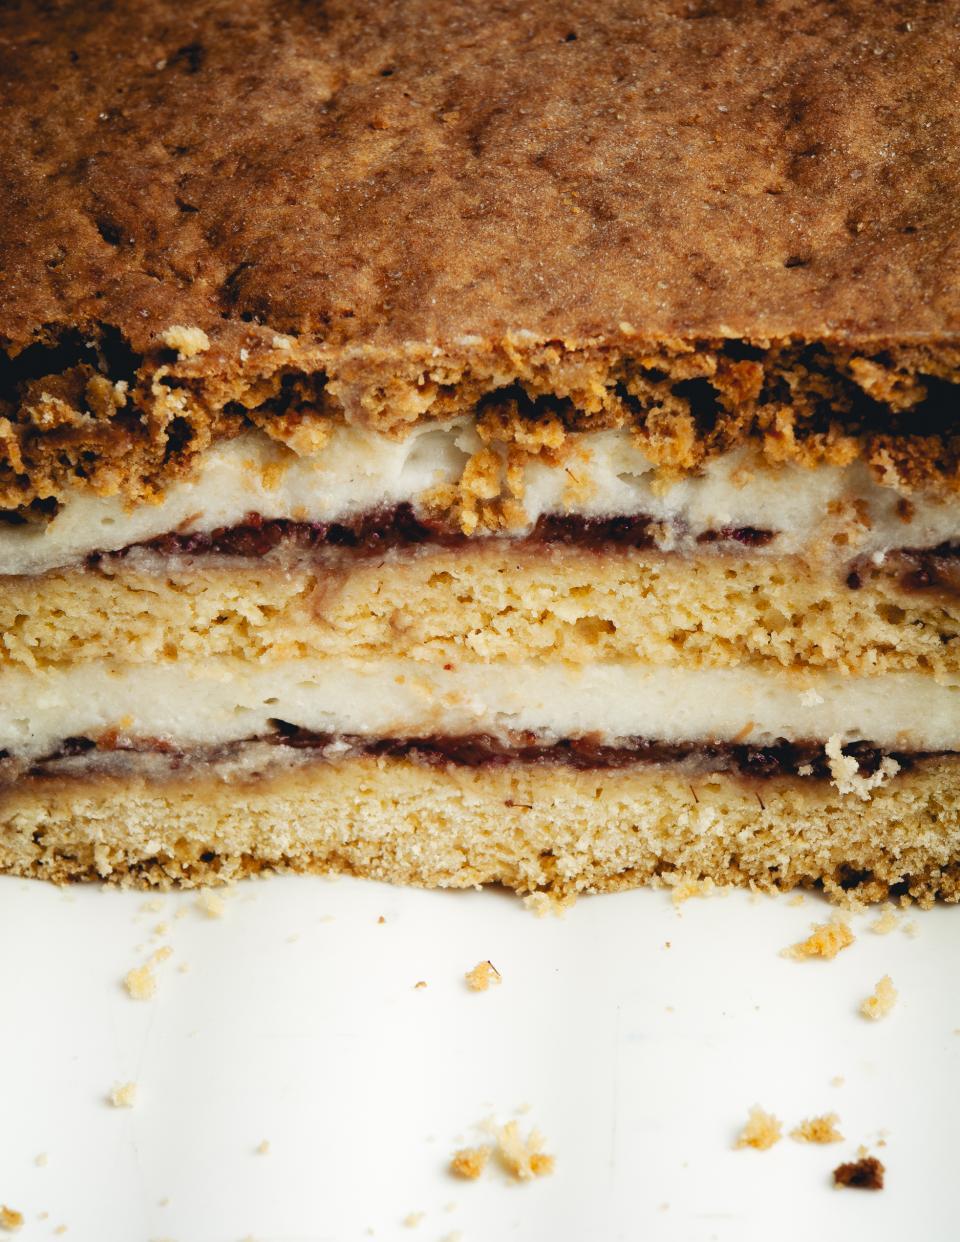 cake, dessert, sweets, food